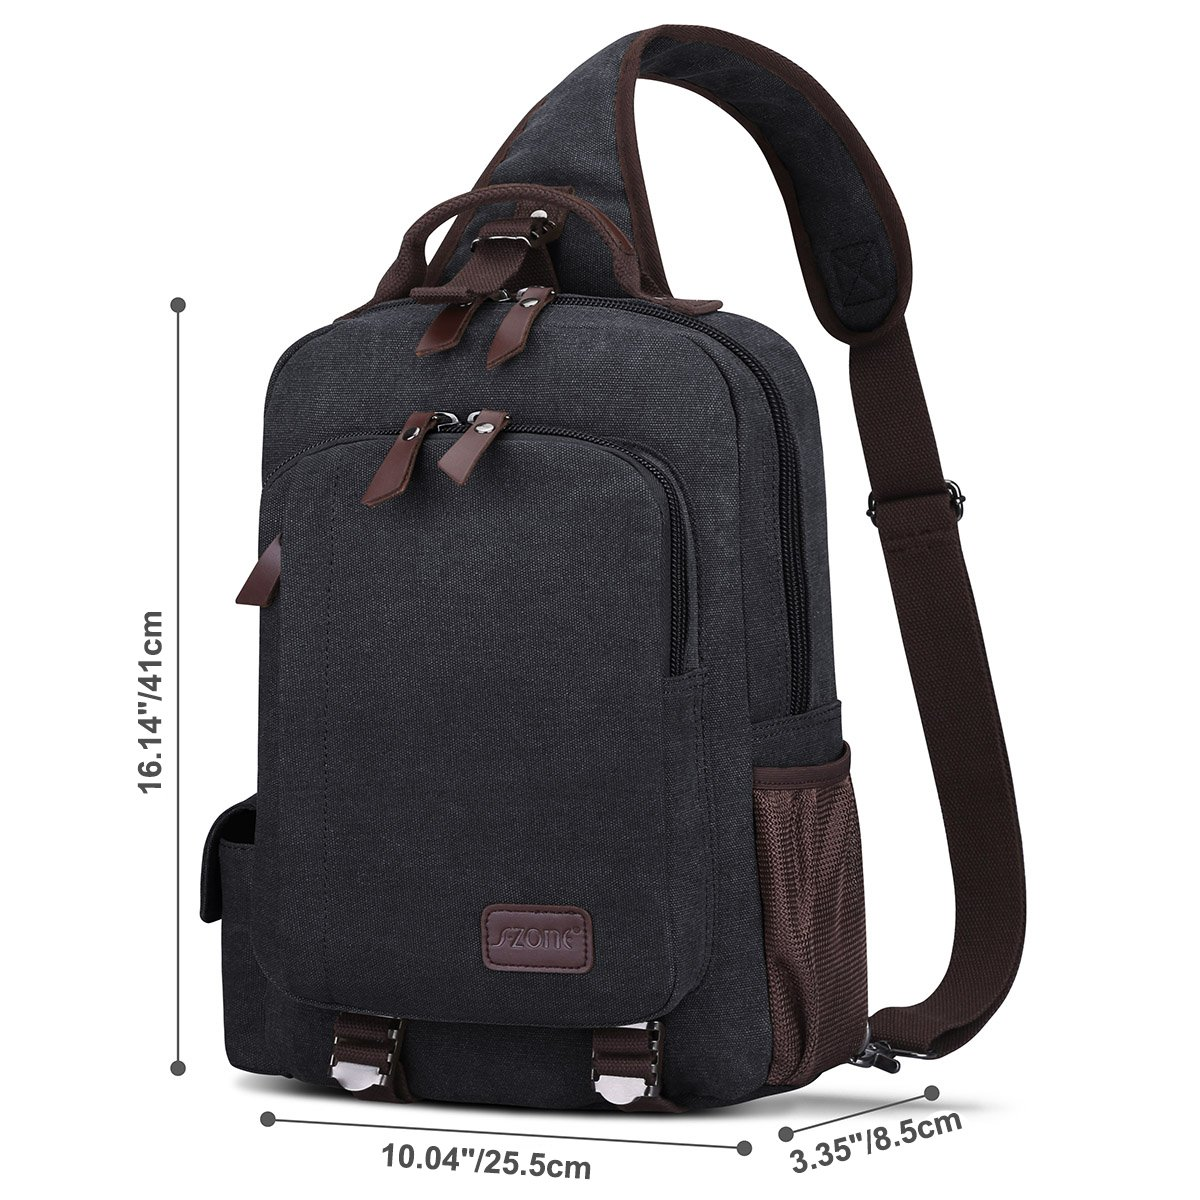 S-Zone Sling Bag for Men Chest Shoulder Gym Backpack Sack Satchel Outdoor Crossbody Pack (Dark Gray) S-ZONE D04V863A